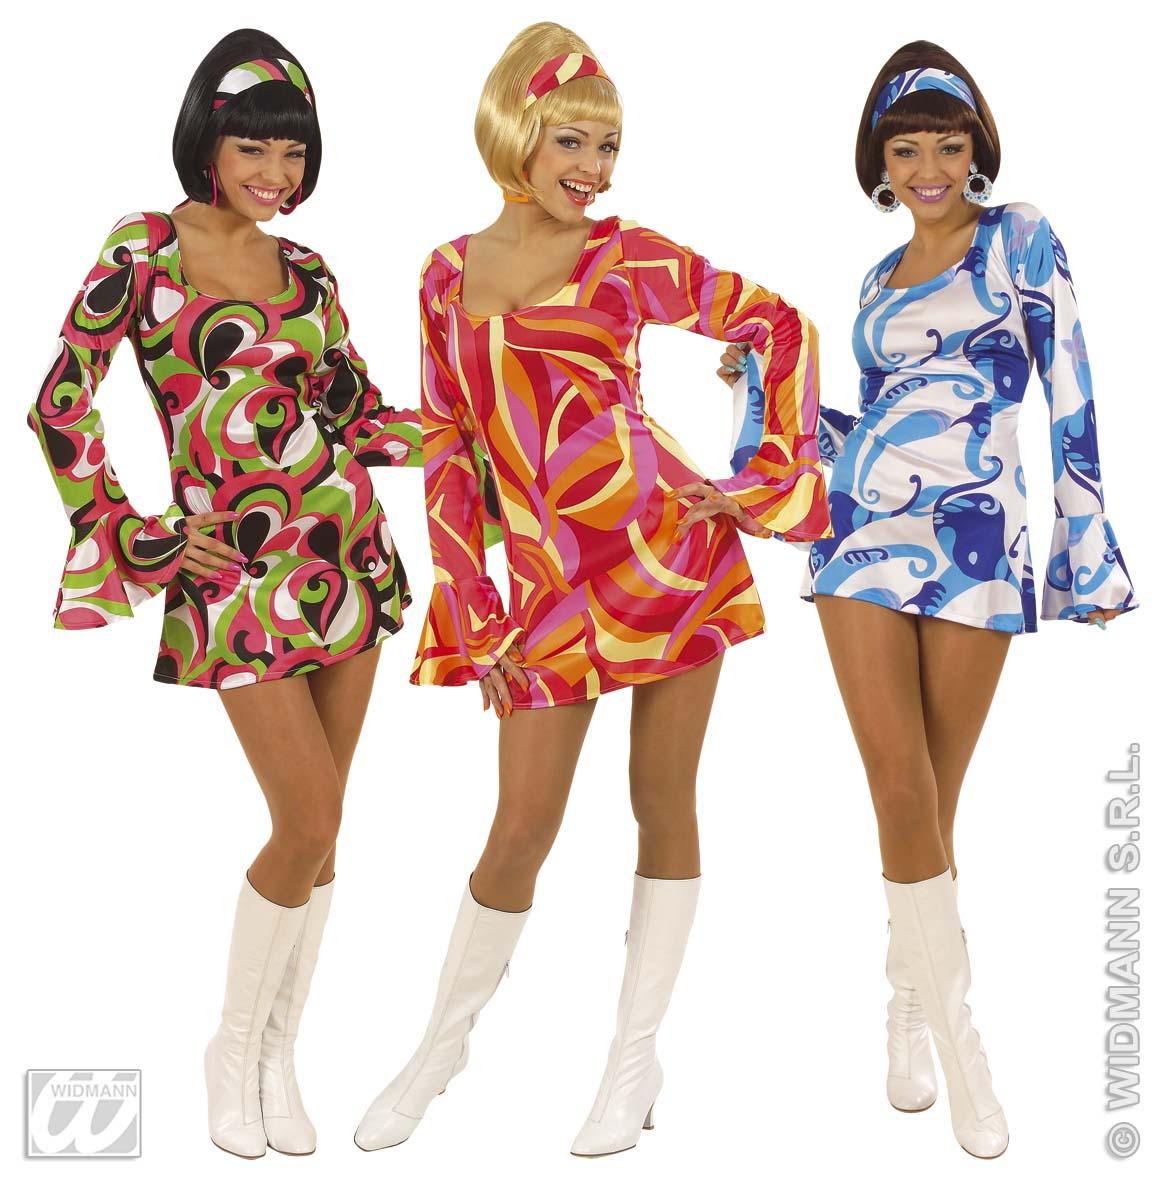 70s Chick Ladies Fancy Dress 60s Hippy Party Costume Ebay